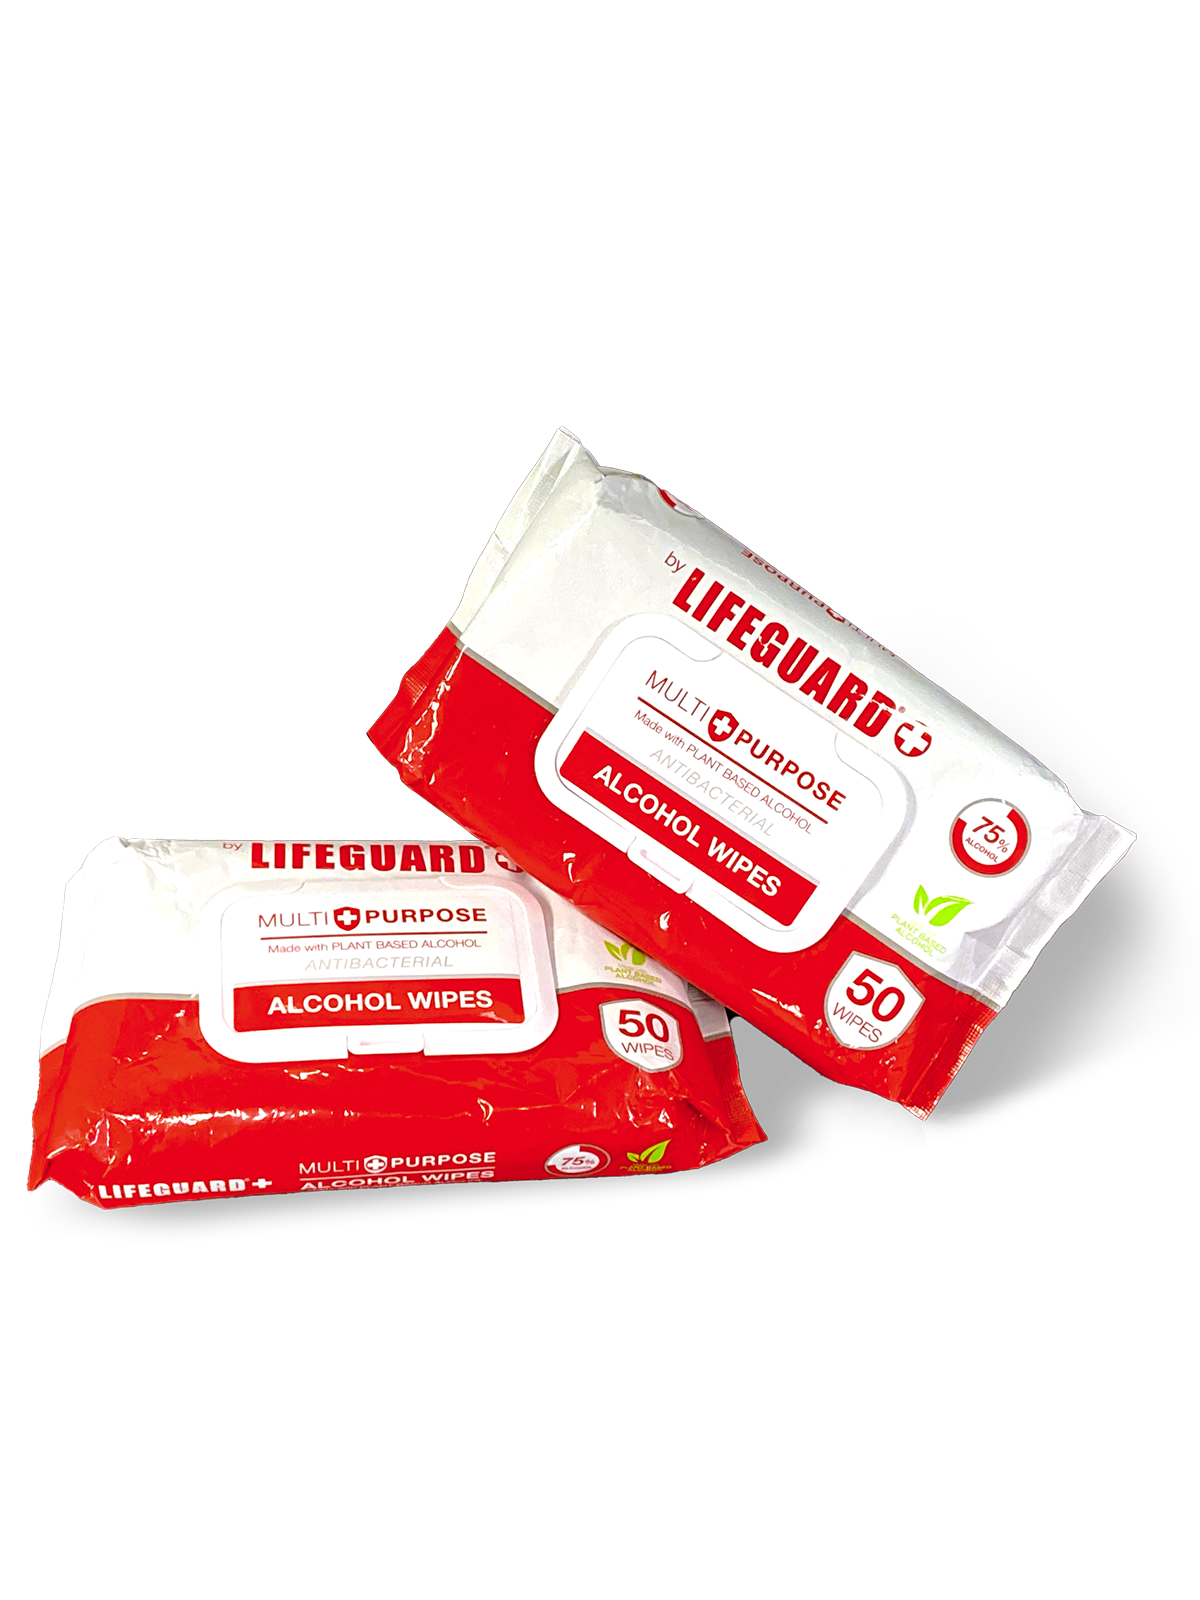 Lifeguard Multi-Purpose Wipes $7.99 each - 36 per case